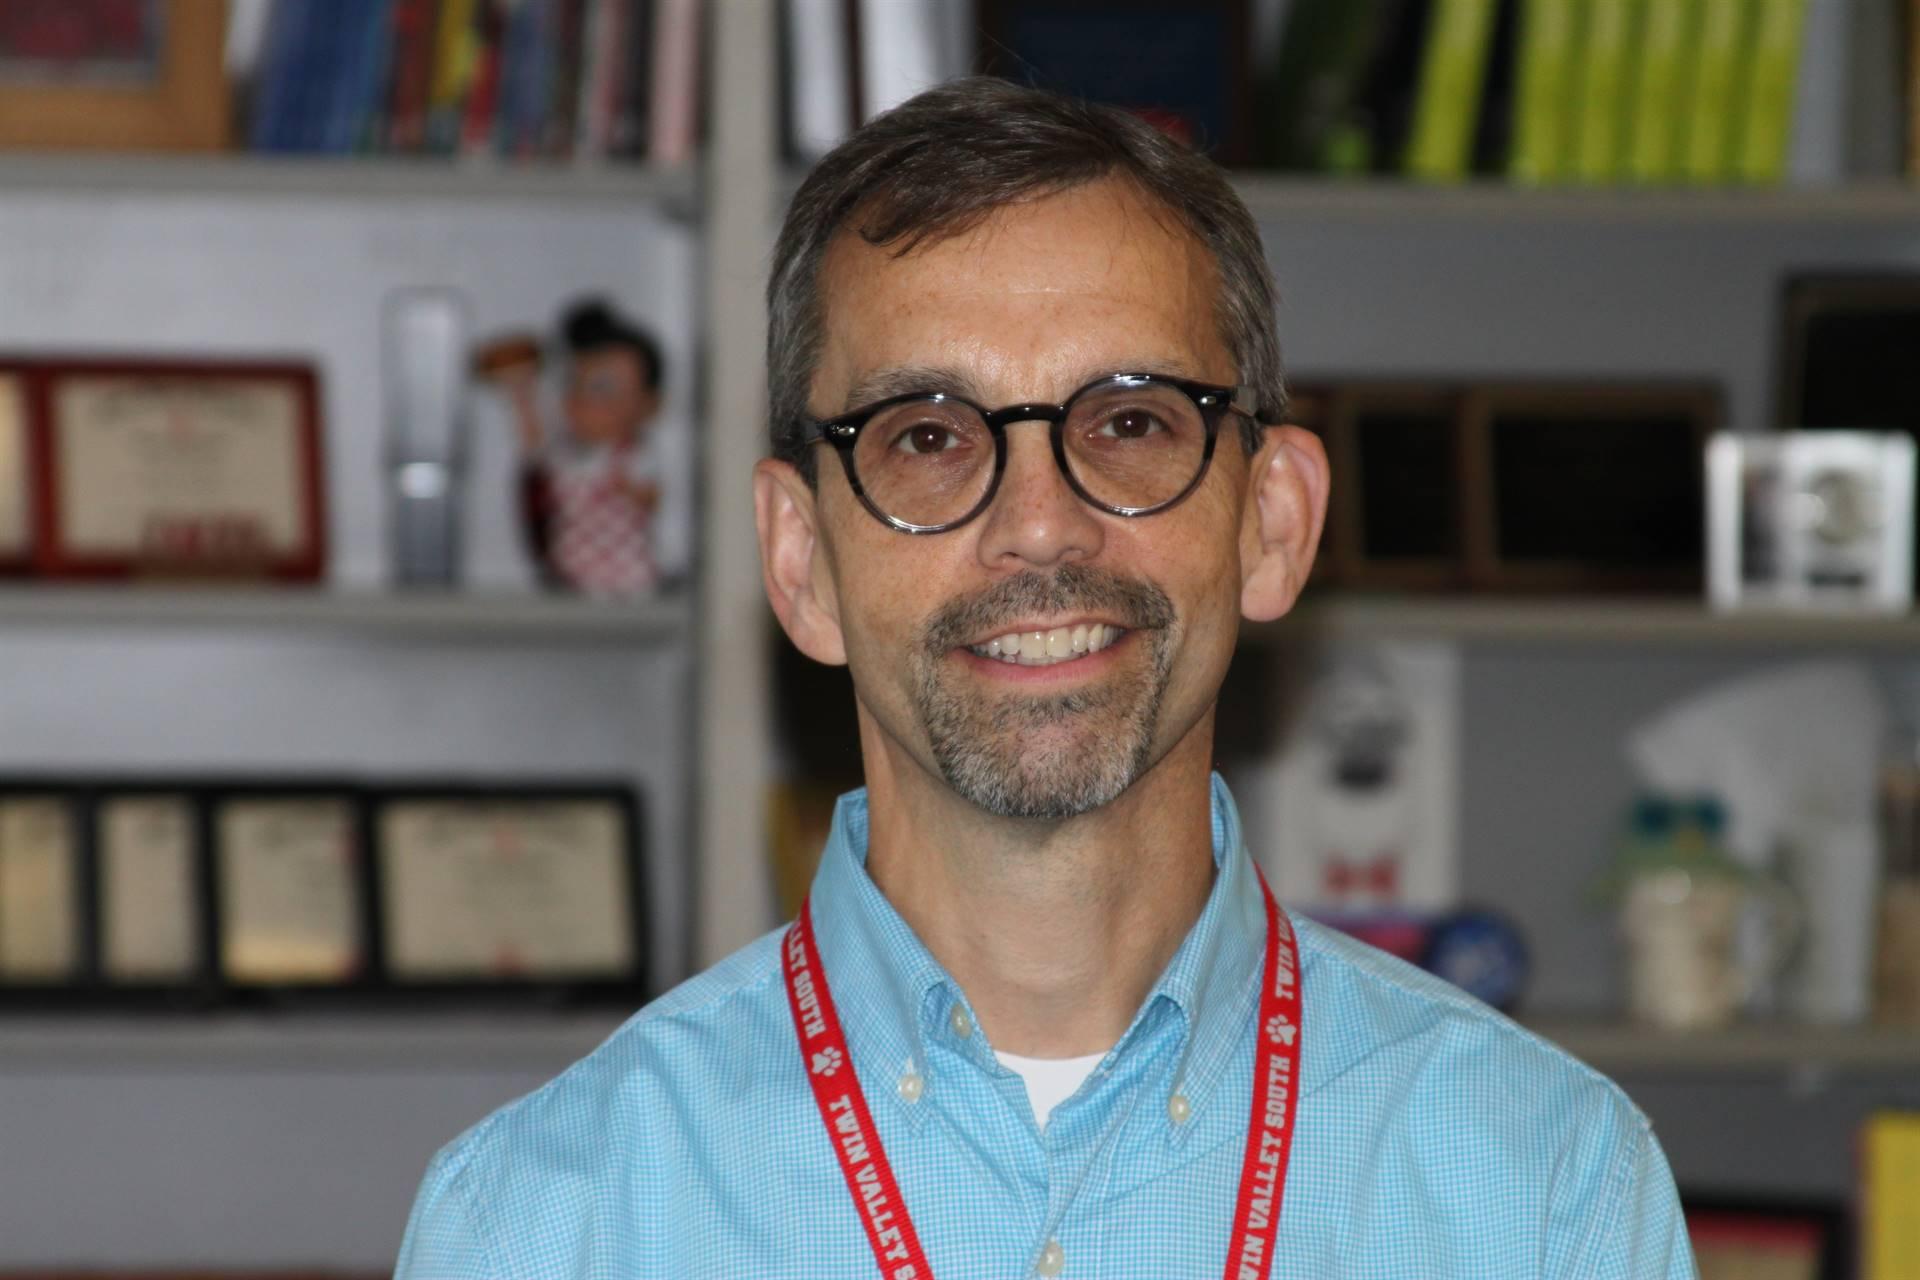 October Teacher of the Month-Mr. Hamblin